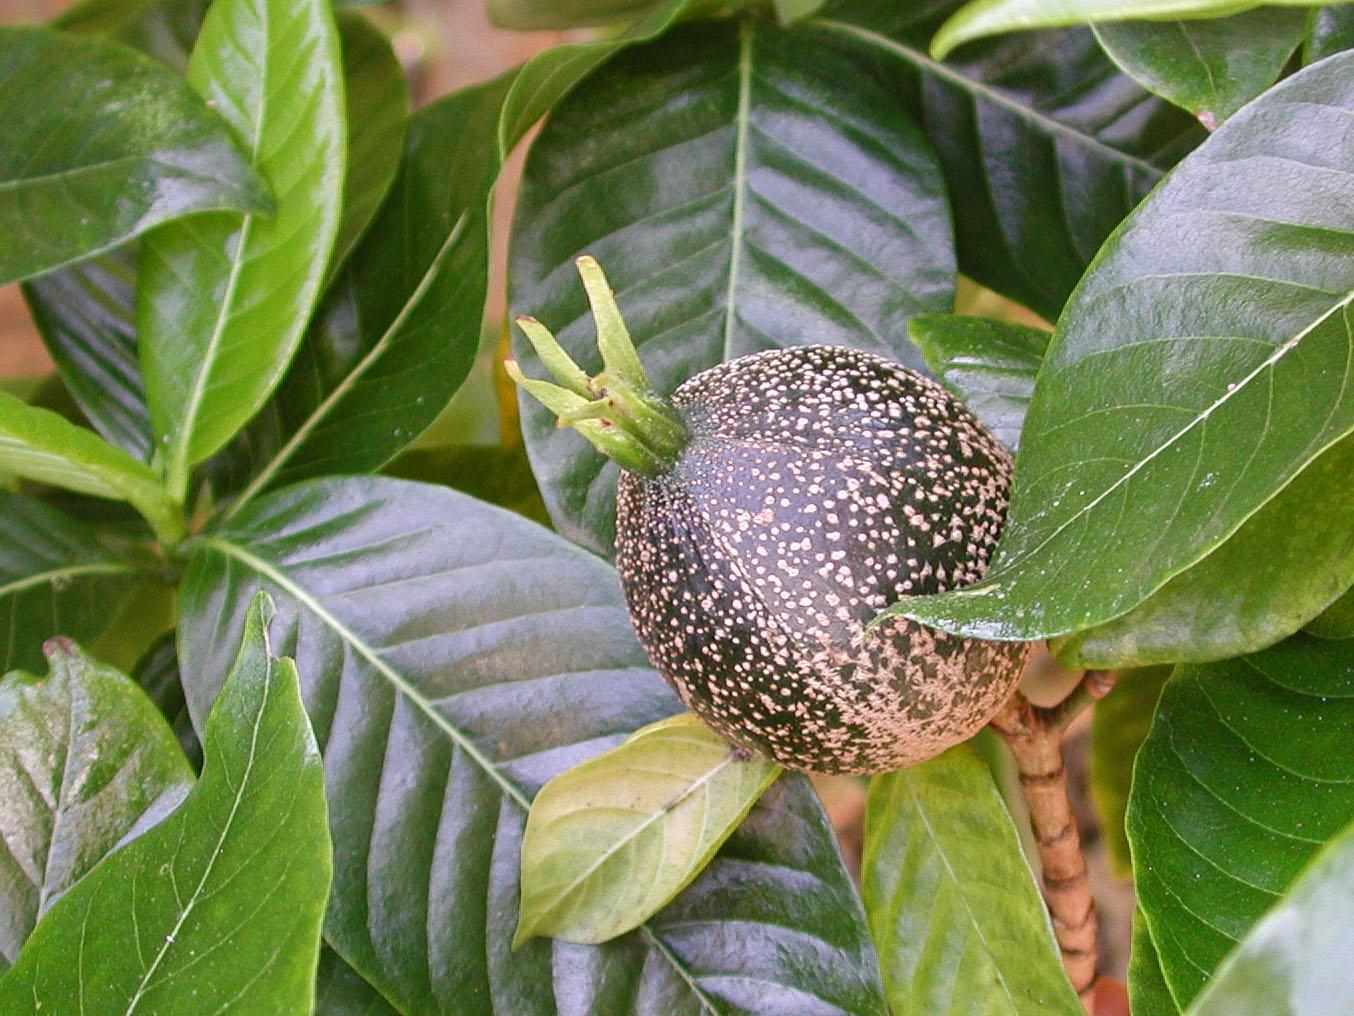 A hawaiian gardenia gardenia brighamii hawaii horticulture izmirmasajfo Images